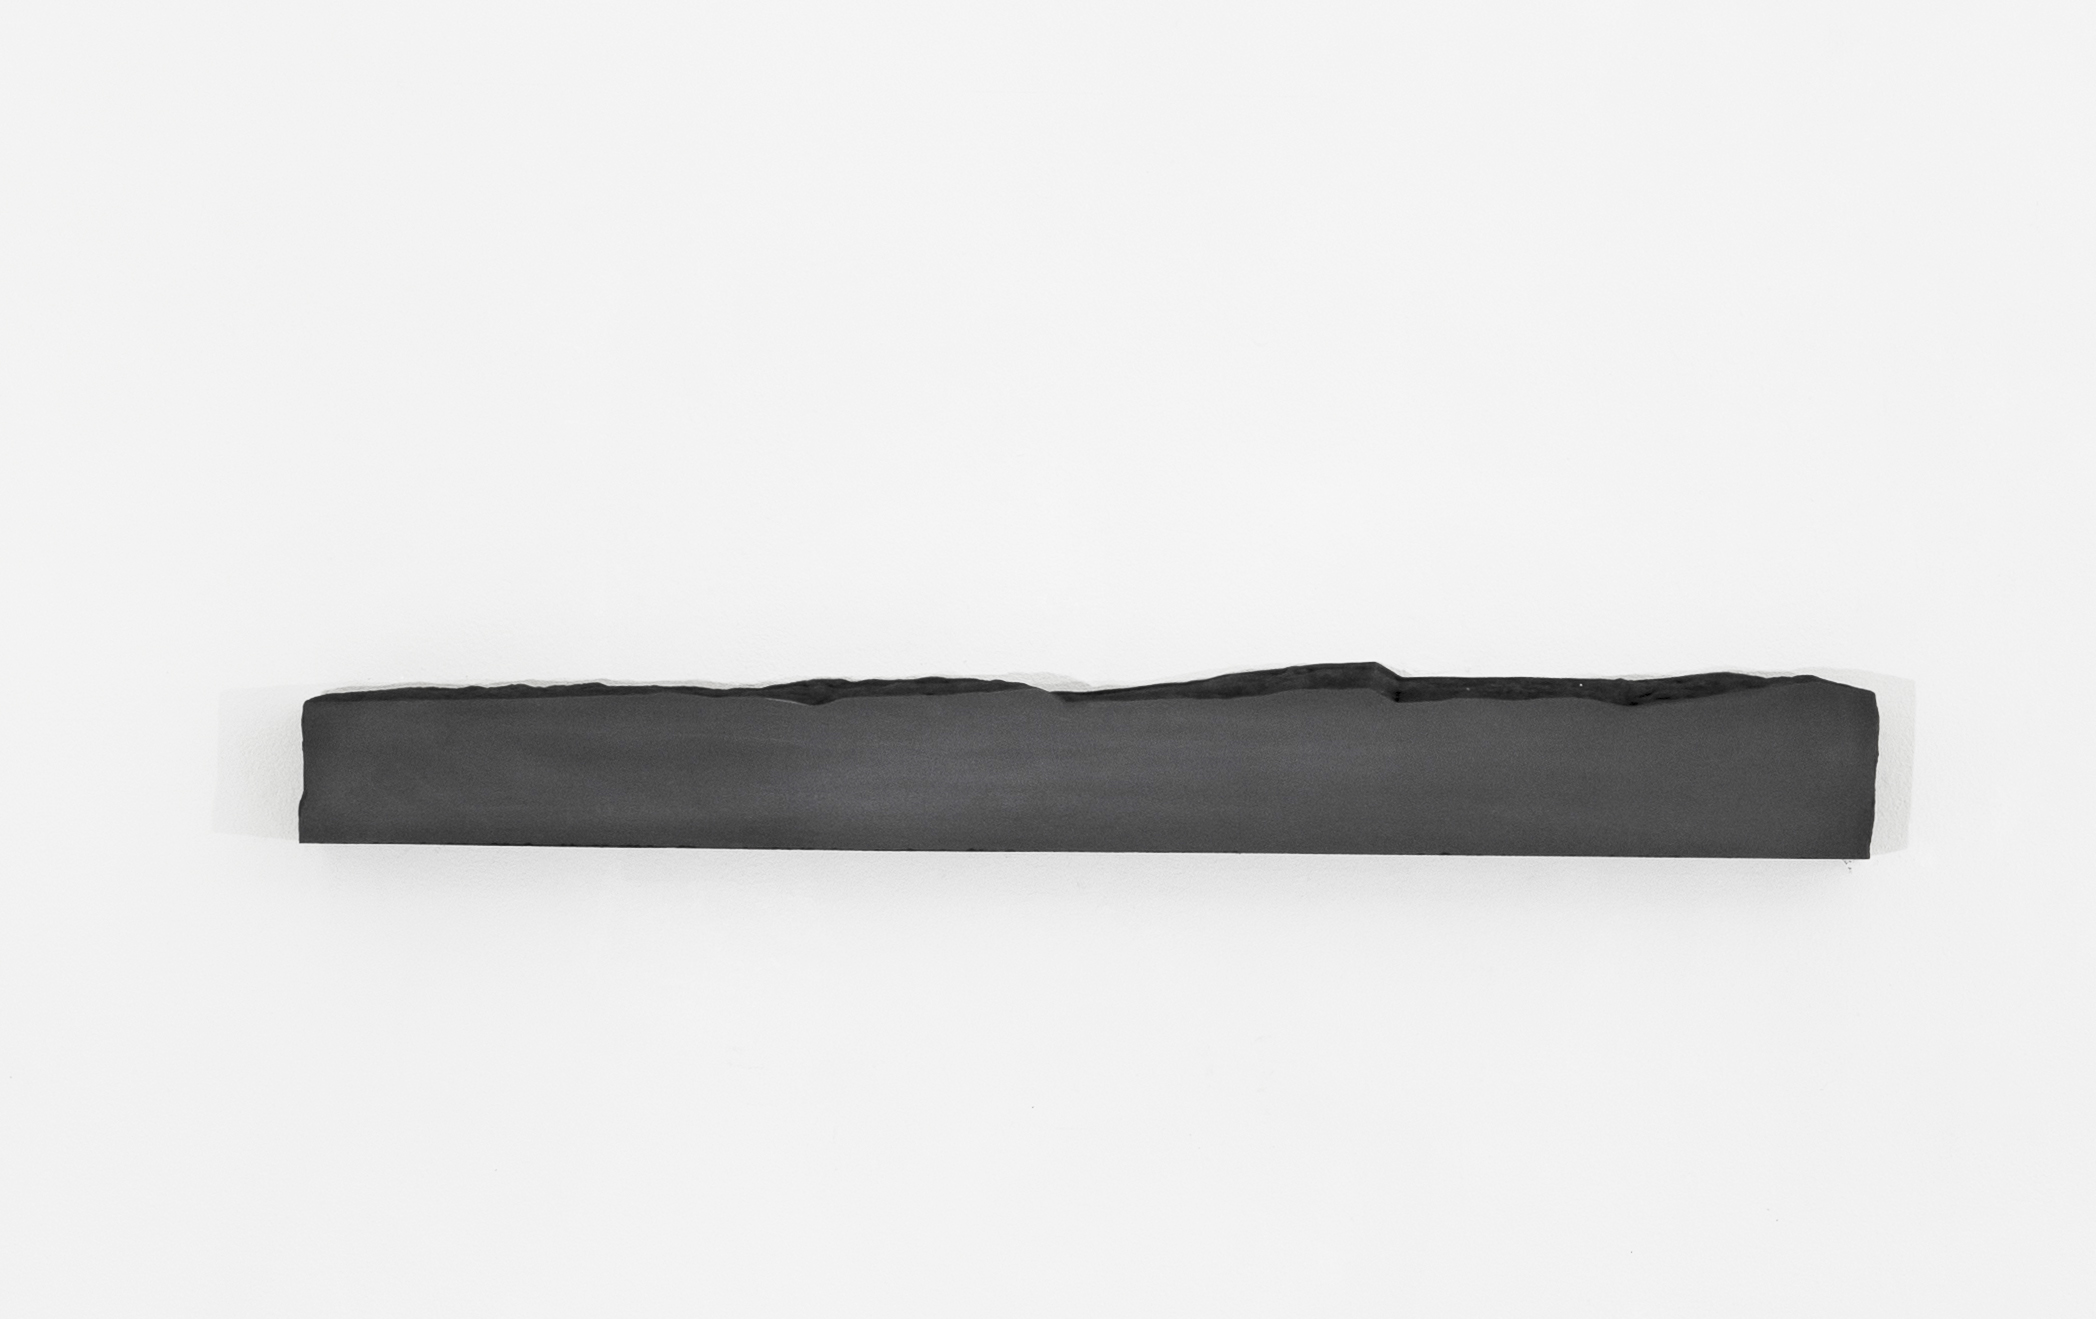 "Foundation IV, no.1, 2017  Solid graphite,46""x 4.25"" x 5.5""  Photo: Maris Hutchinson/EPW Studio; courtesy of The Drawing Center"